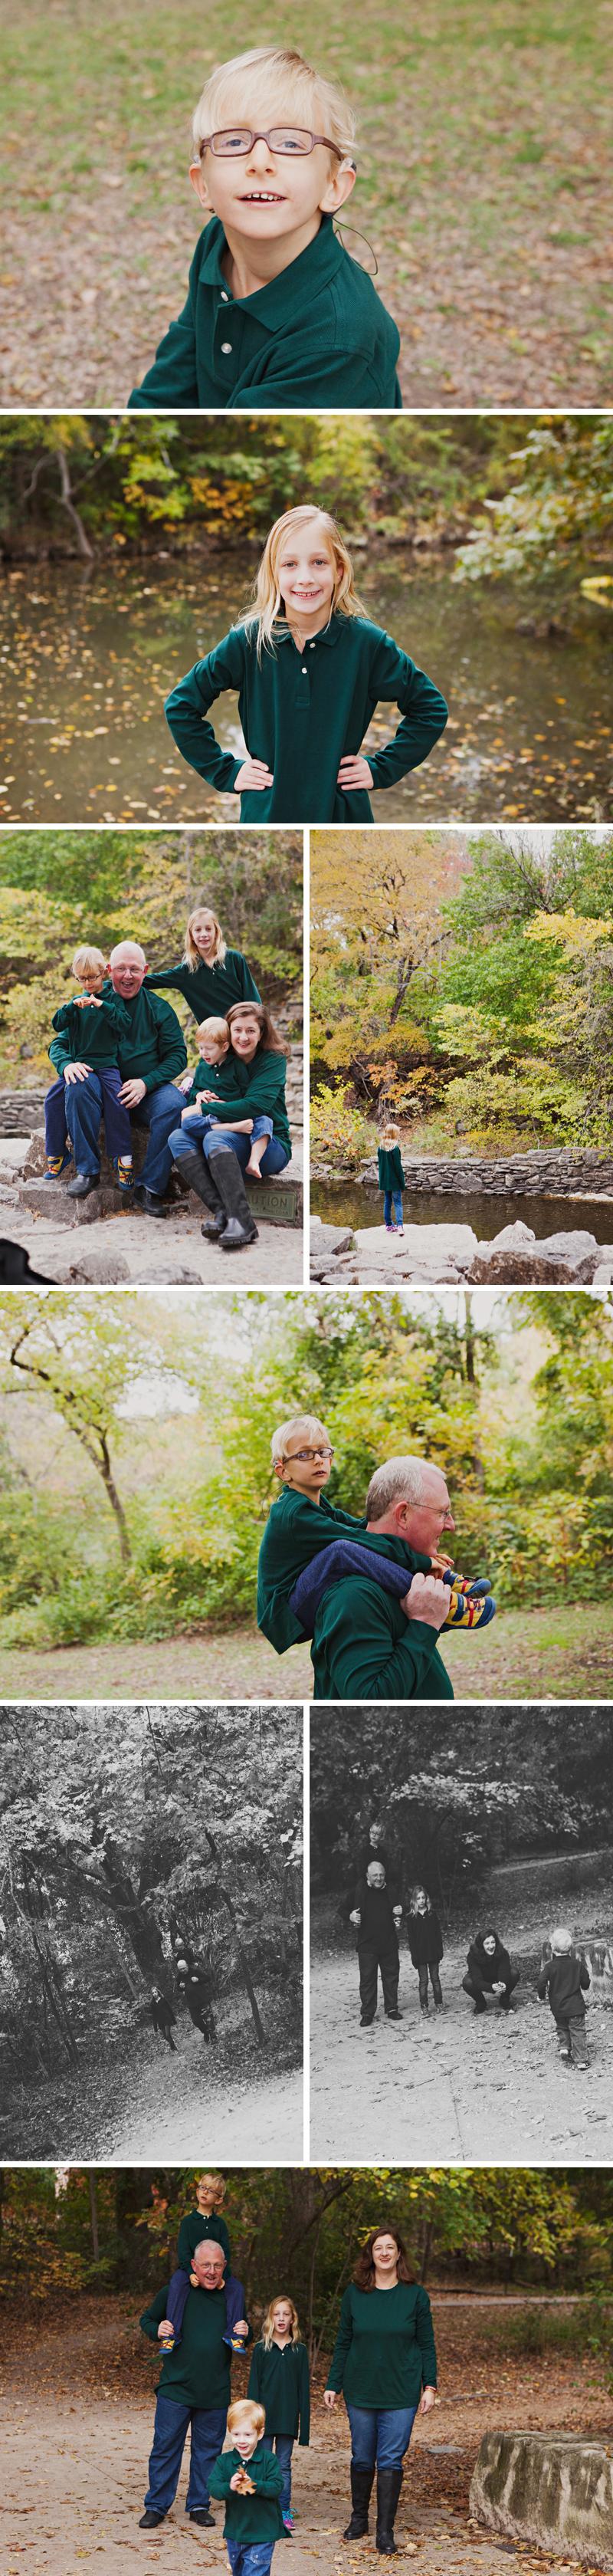 Dallas-Family-Photographerc047